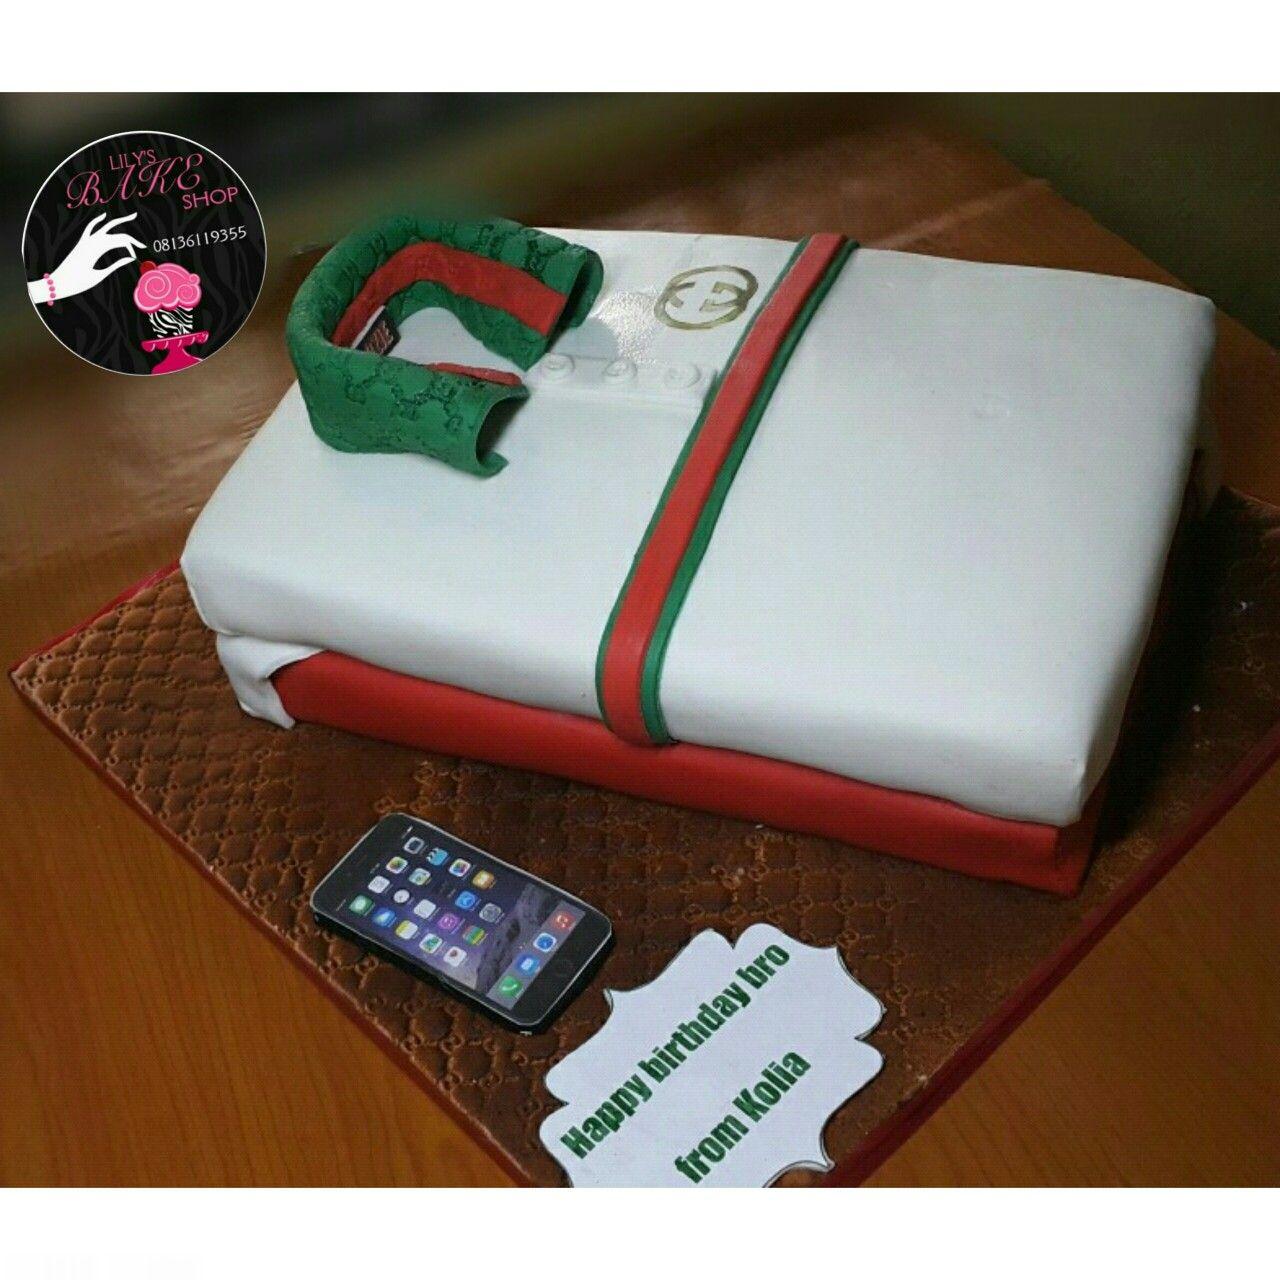 Lilysbakeshop Gucci Shirt Cake Lilysbakeshop MY CAKES - Birthday cake shirt